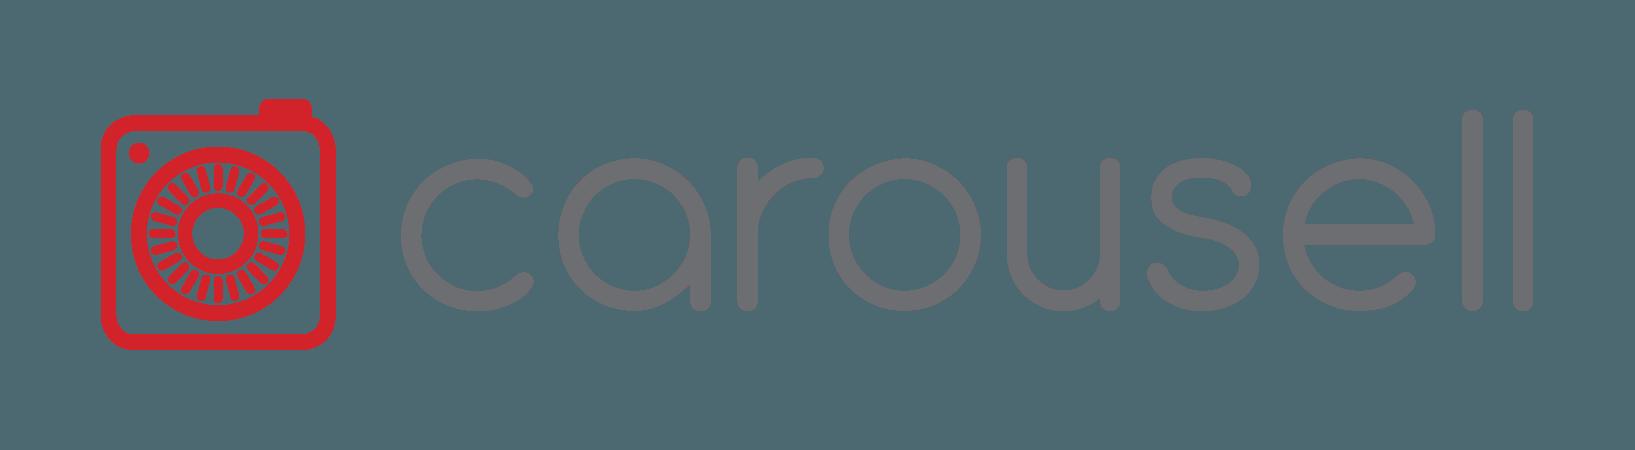 carouselllogo